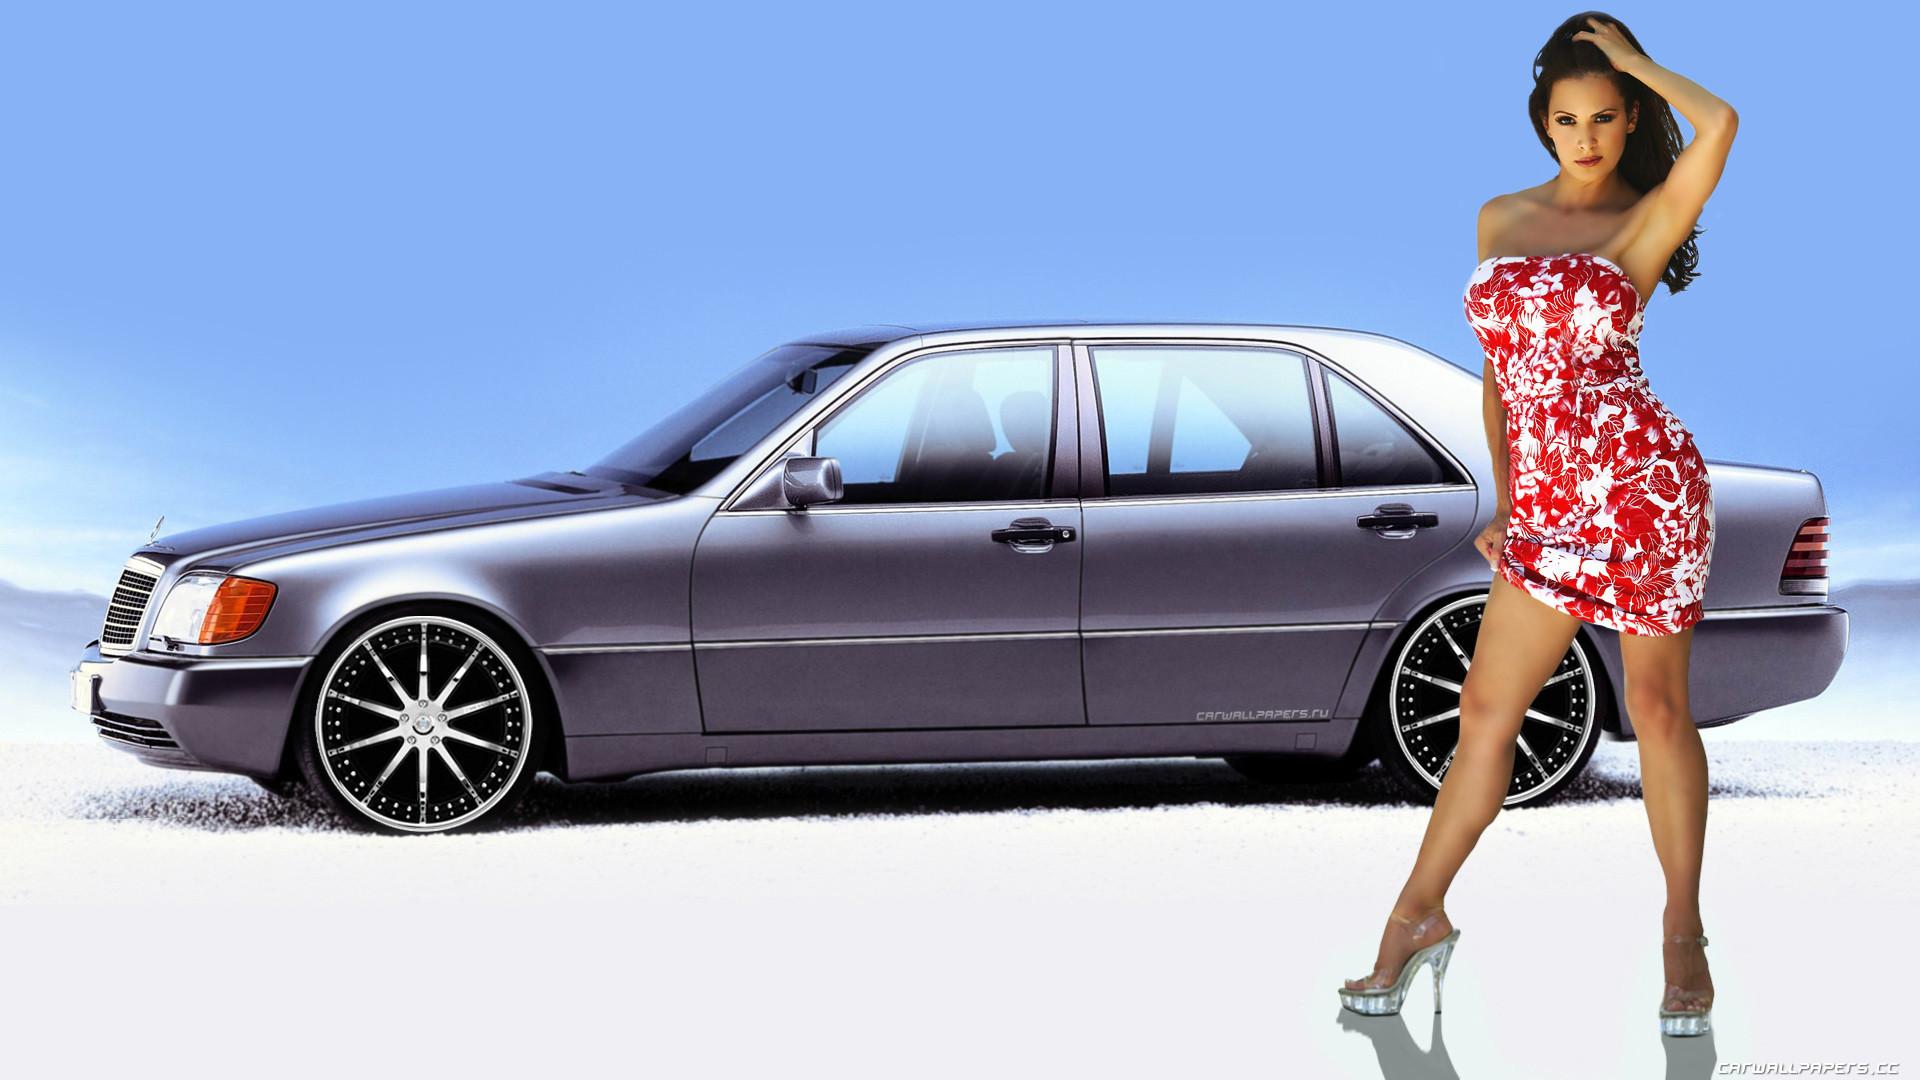 Car and Girl desktop wallpapers